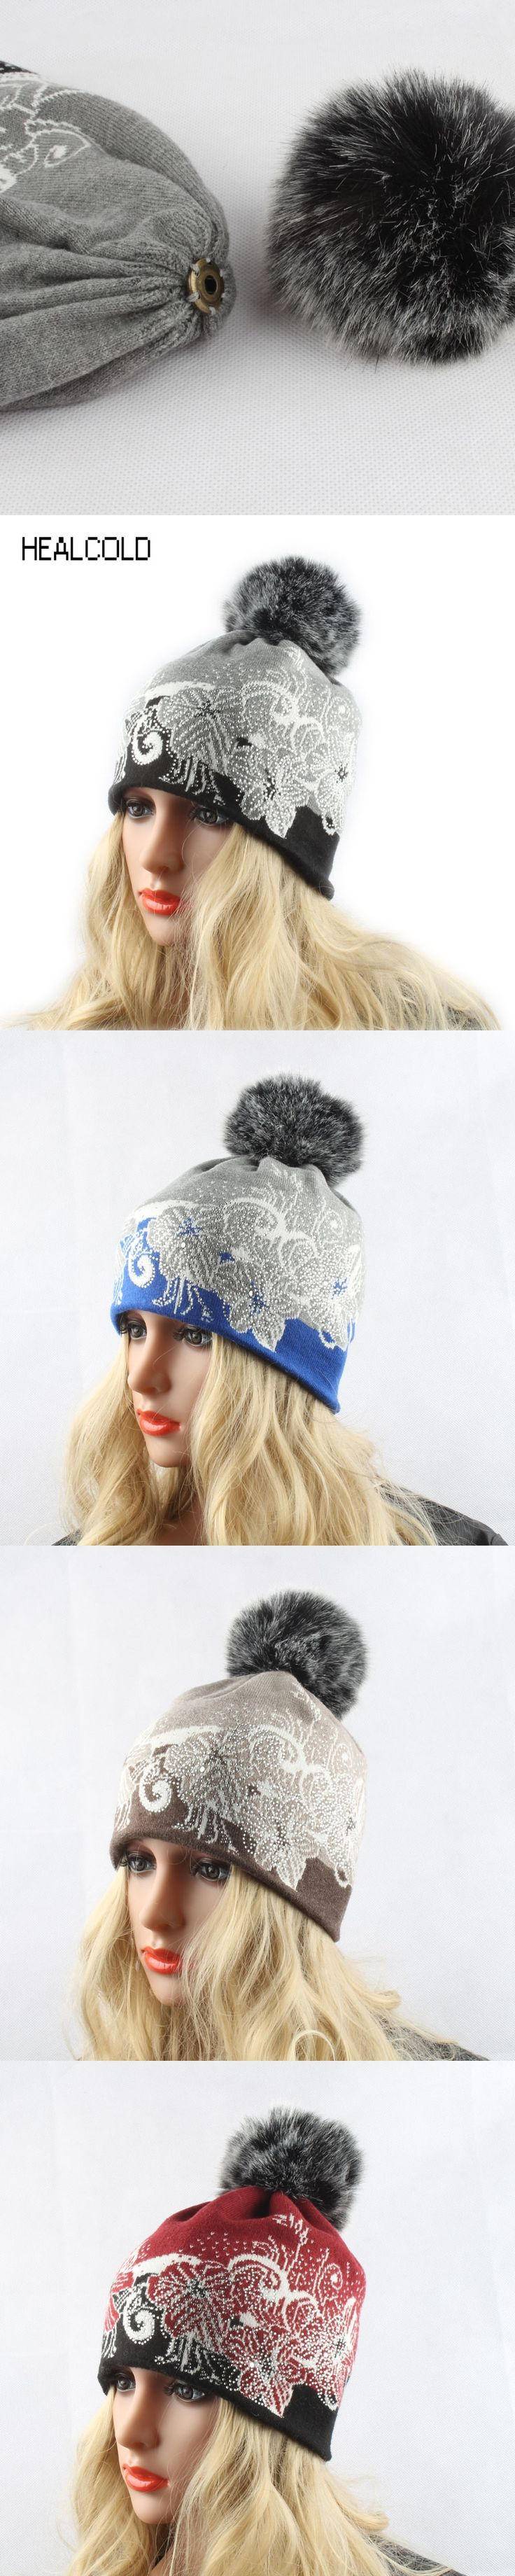 Women Winter Rabbit Fur Hats Ladies Knitted Wool Beanies Faux Fur Pompom Hat Warm Casual Beanie Cap Skullies